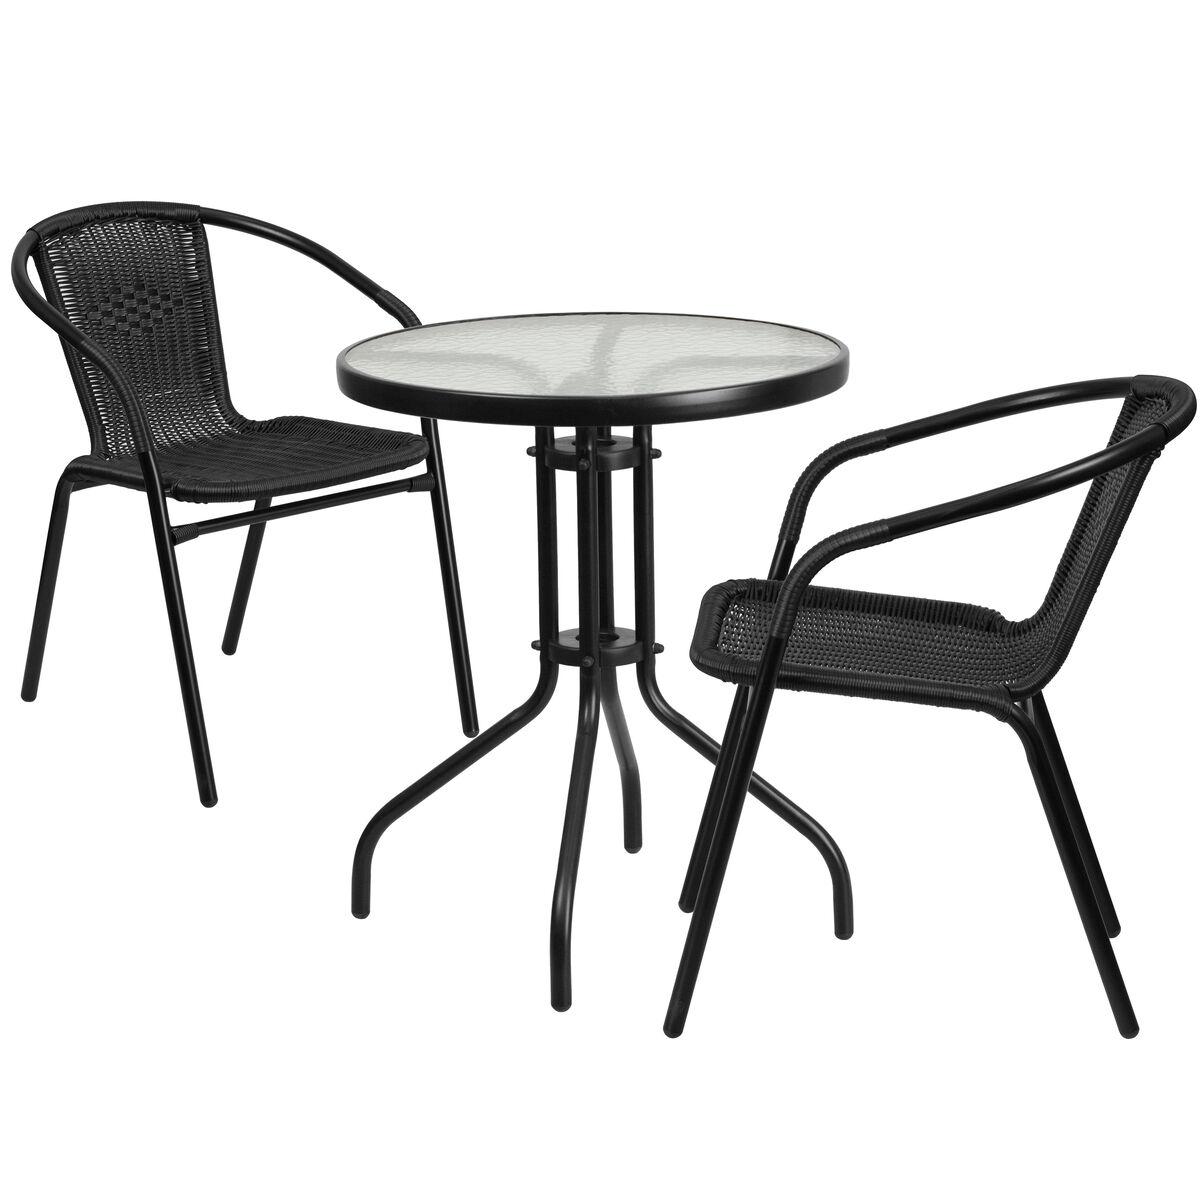 23 75rd Black Patio Table Set Tlh 071rd 037bk2 Gg